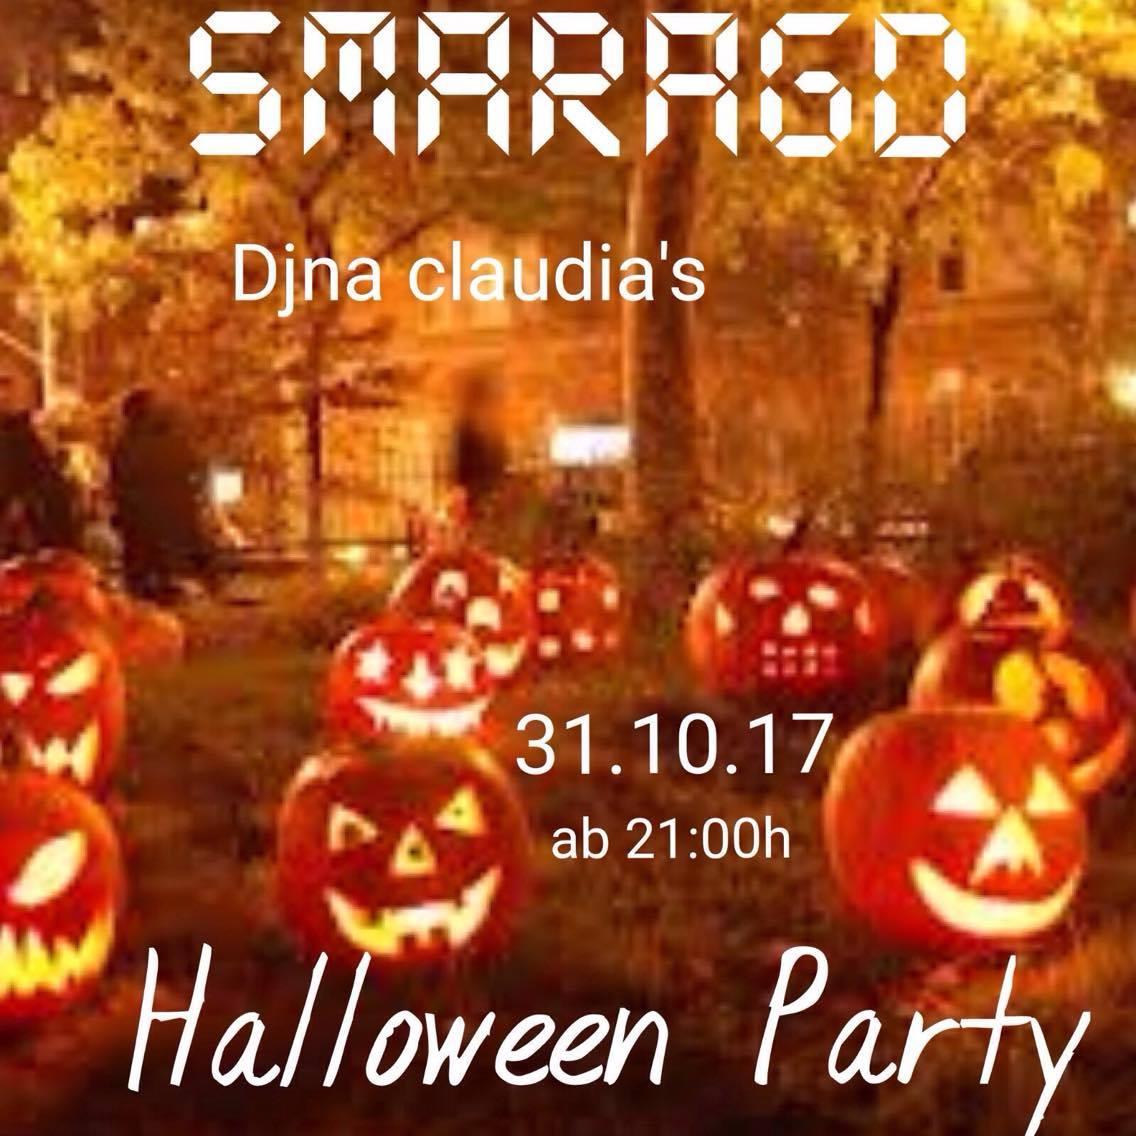 Cultur Cafe Smaragd Linz-Event-Halloween Party